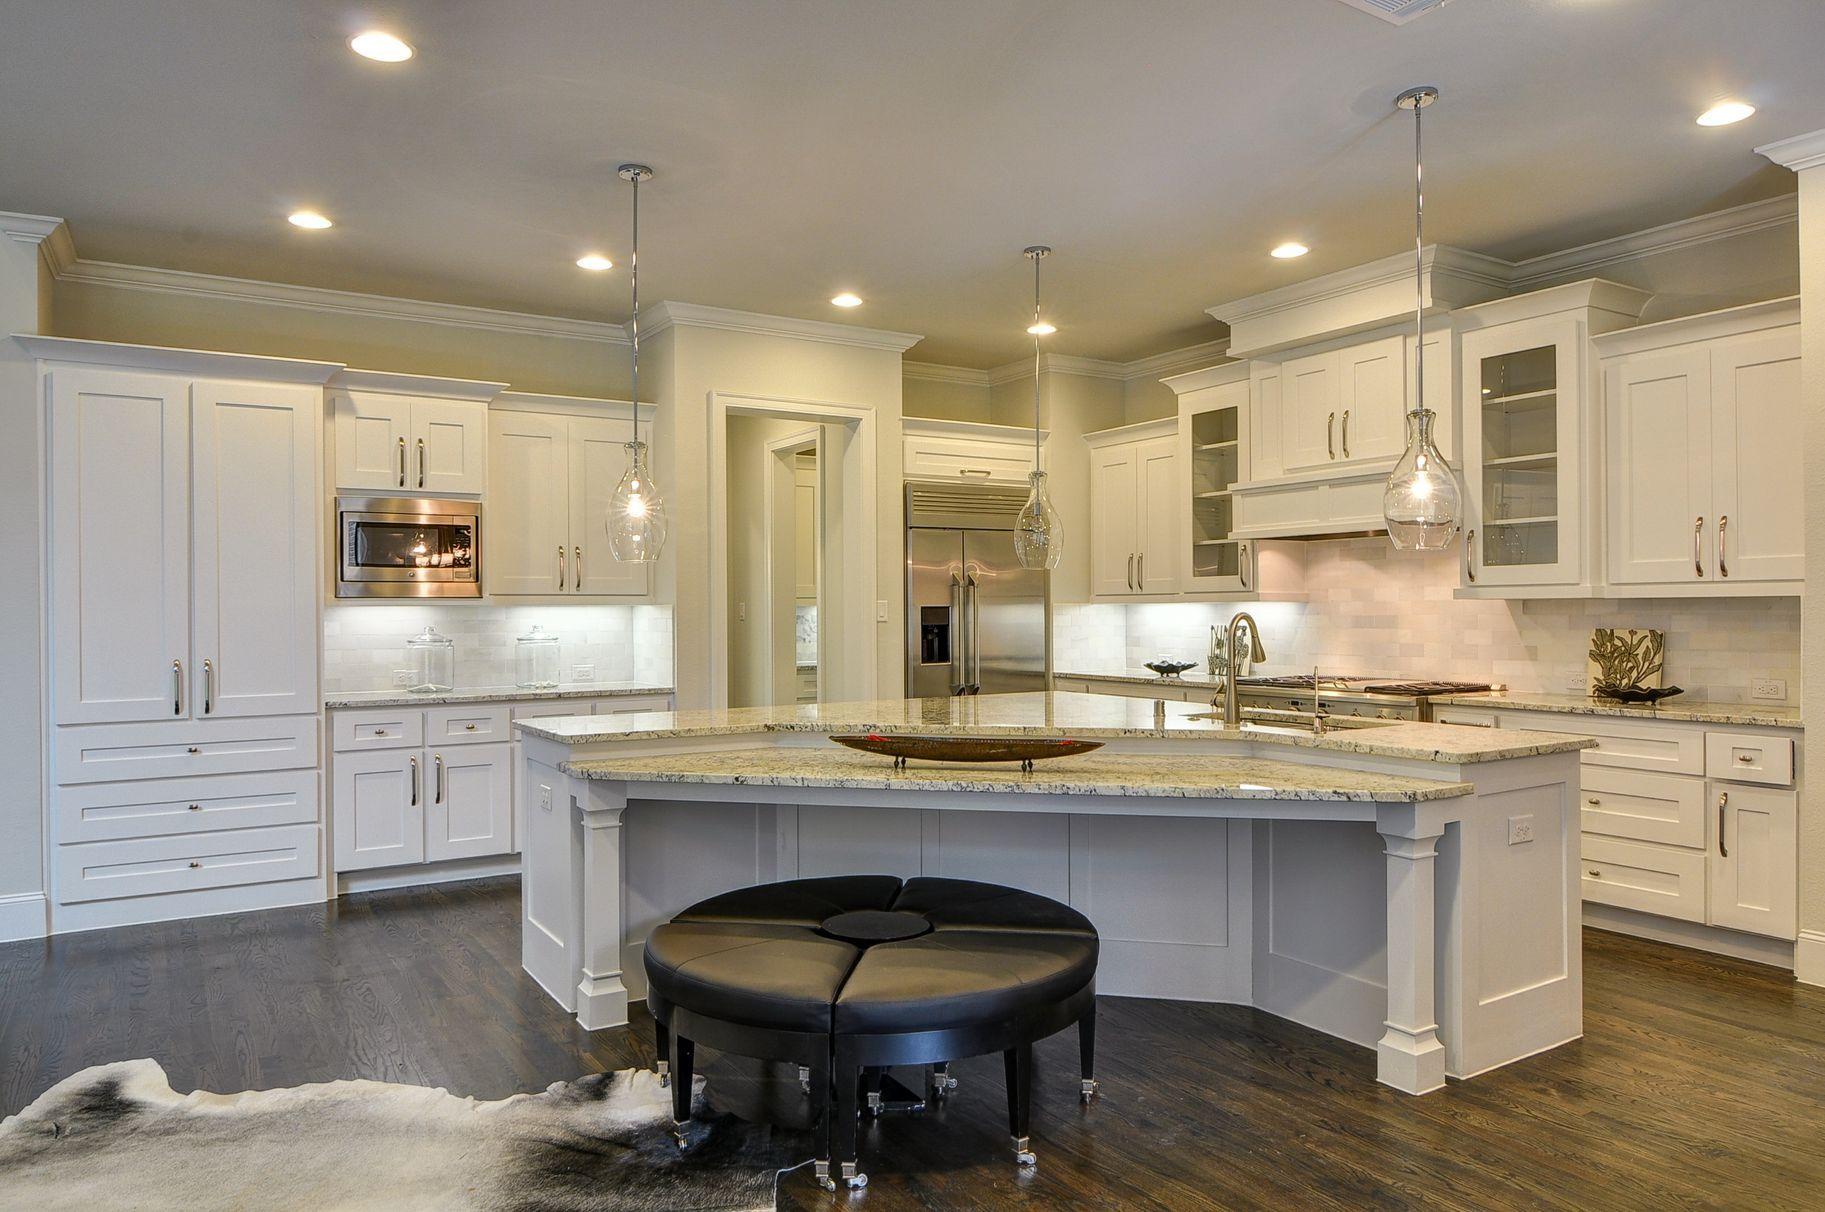 8139 San Leandro Dallas Tx 75218 White Kitchen Cabinets Island With Seating White Kitchen